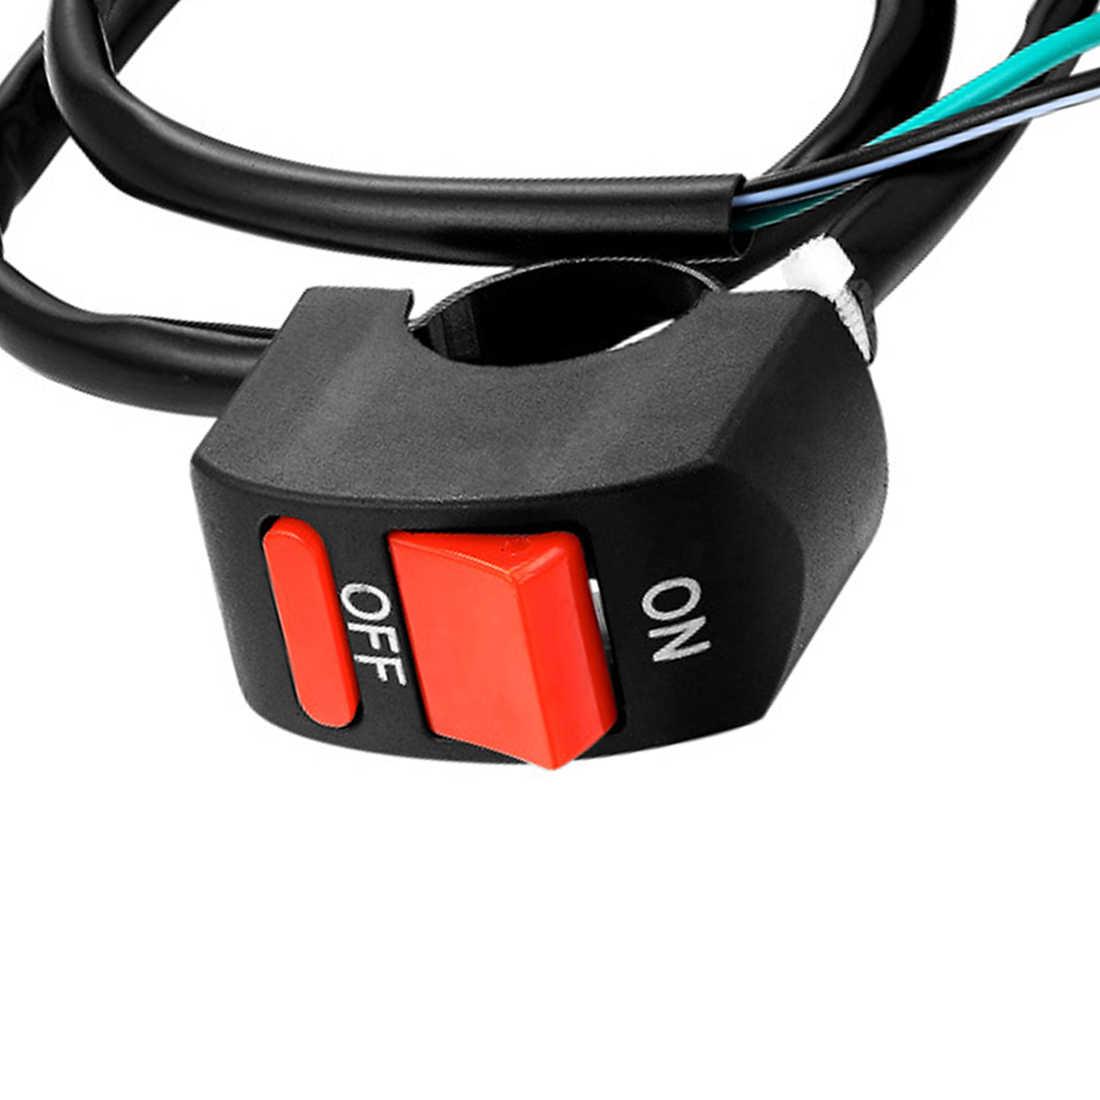 Universal Motorcycle Handlebar Fog Light Switch ON-OFF Button Switch 12VDC For U2 U5 U7 U8 LED Head Lamp Angel Eye Light